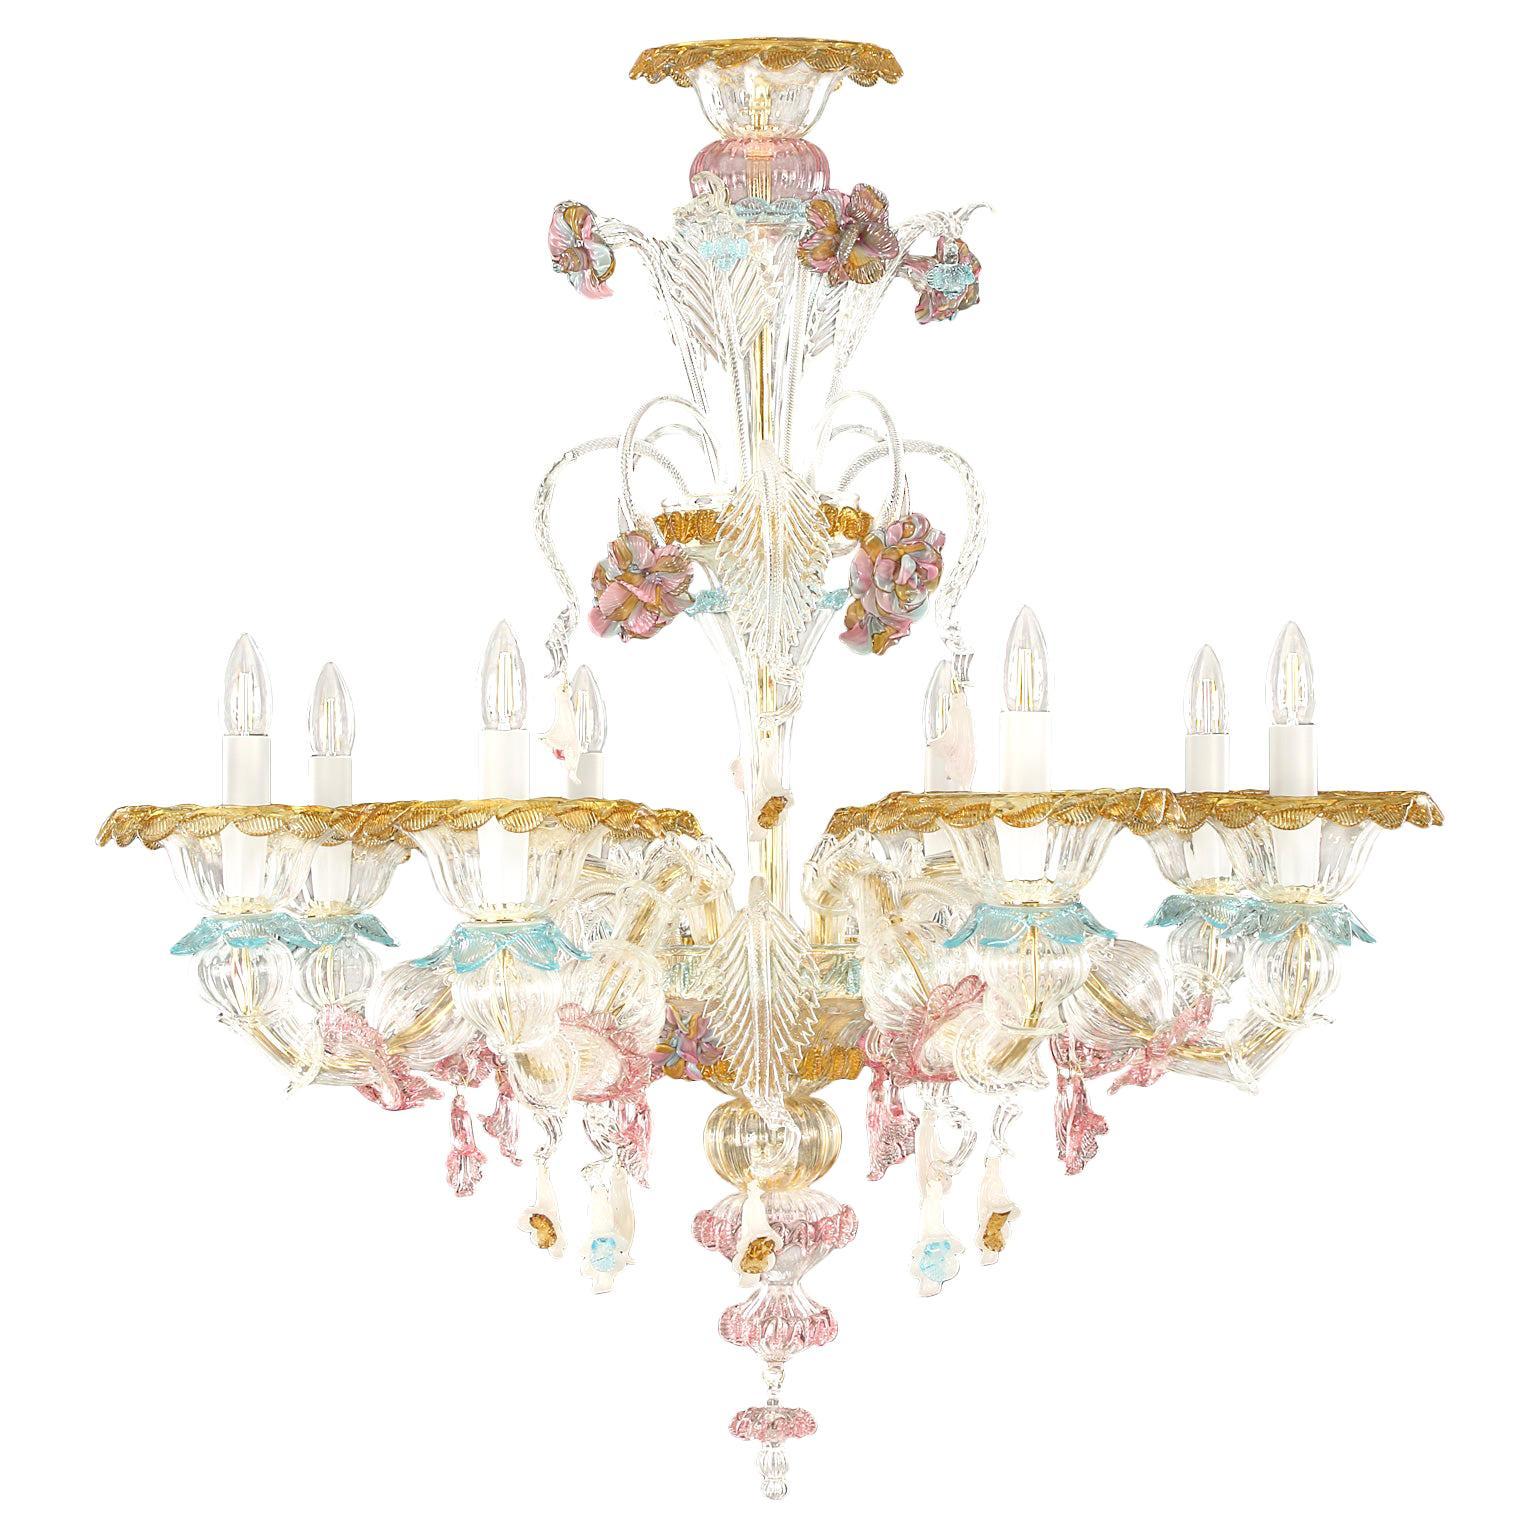 Artistic Murano Rezzonico Chandelier 8 arms Glass multicolour by Multiforme